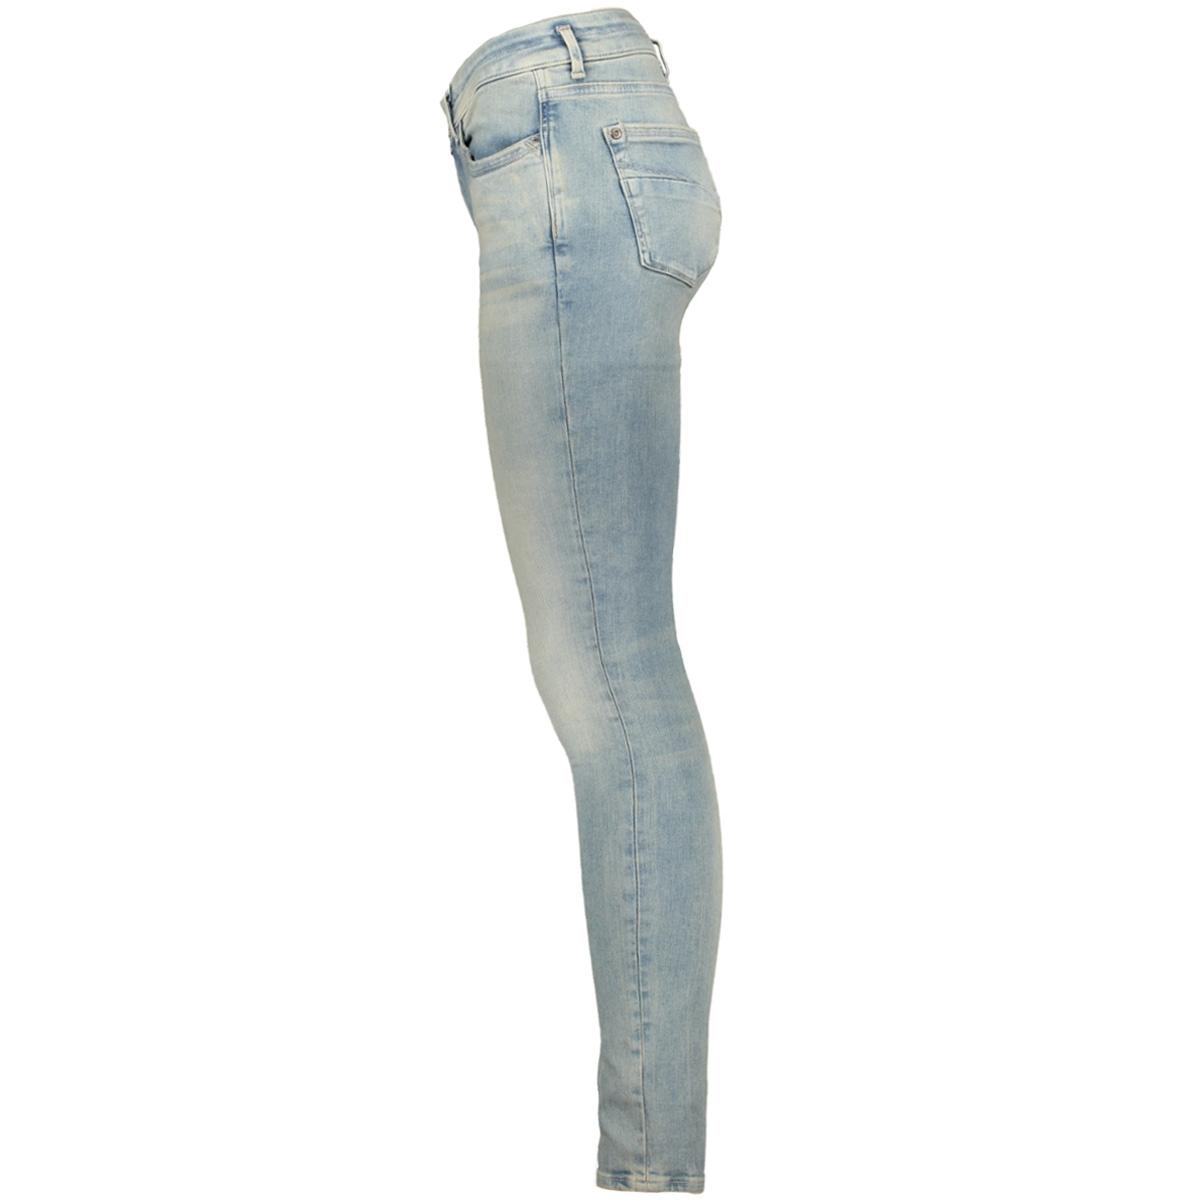 279/32 rachelle 279/32 garcia jeans 2480 flow denim light used